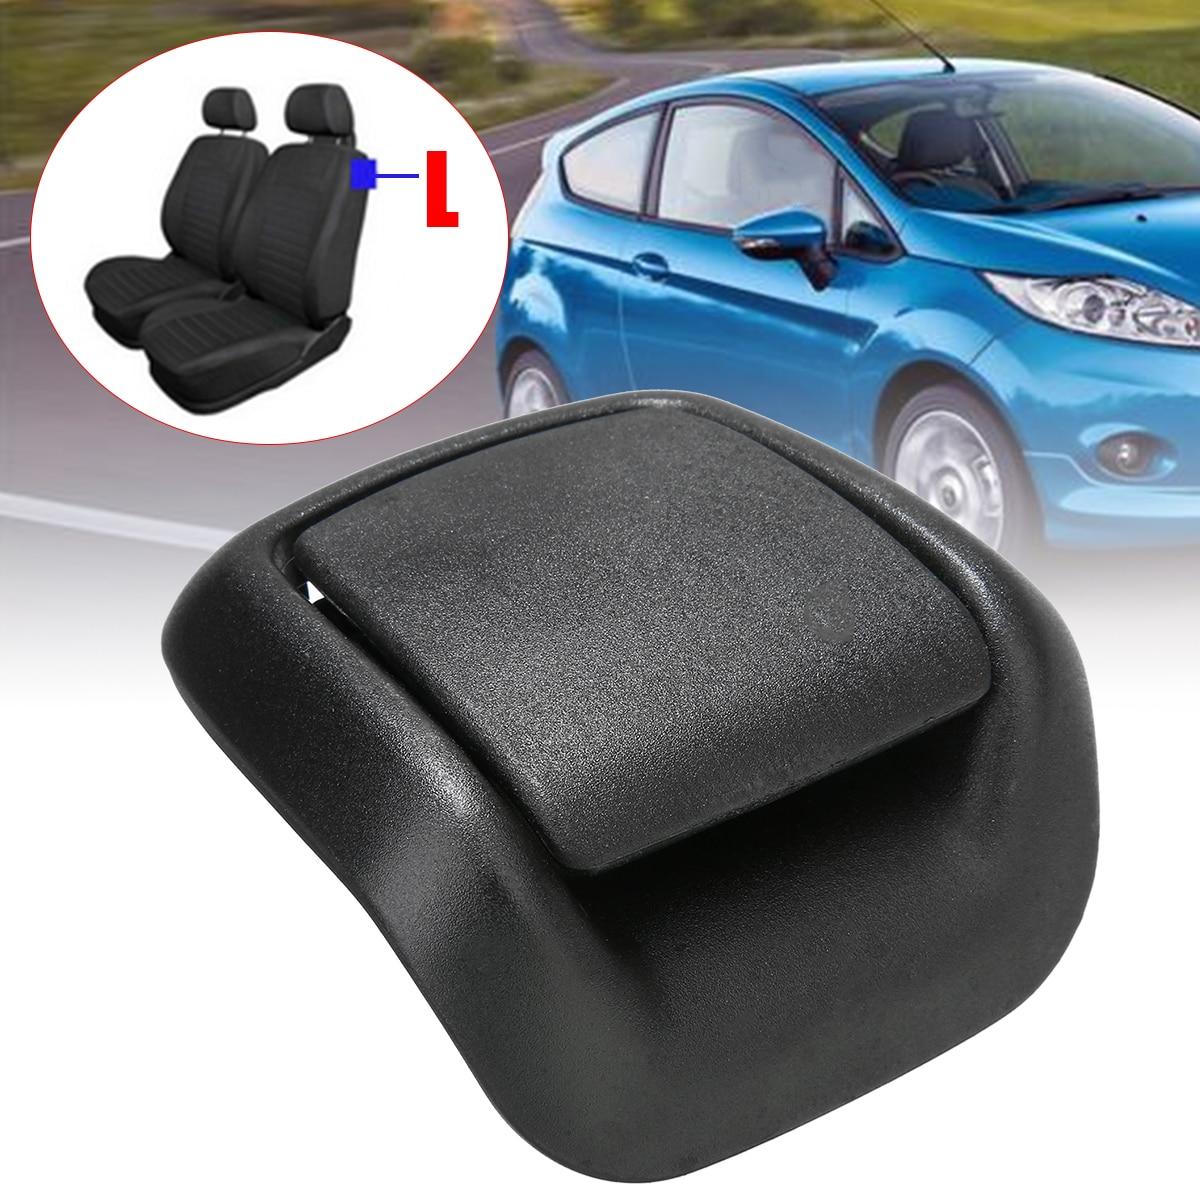 Mayitr 1pc Front Left Side Seat Tilt Handle Plastic 1417521 For Ford Fiesta MK6 VI 3 Door 02-08